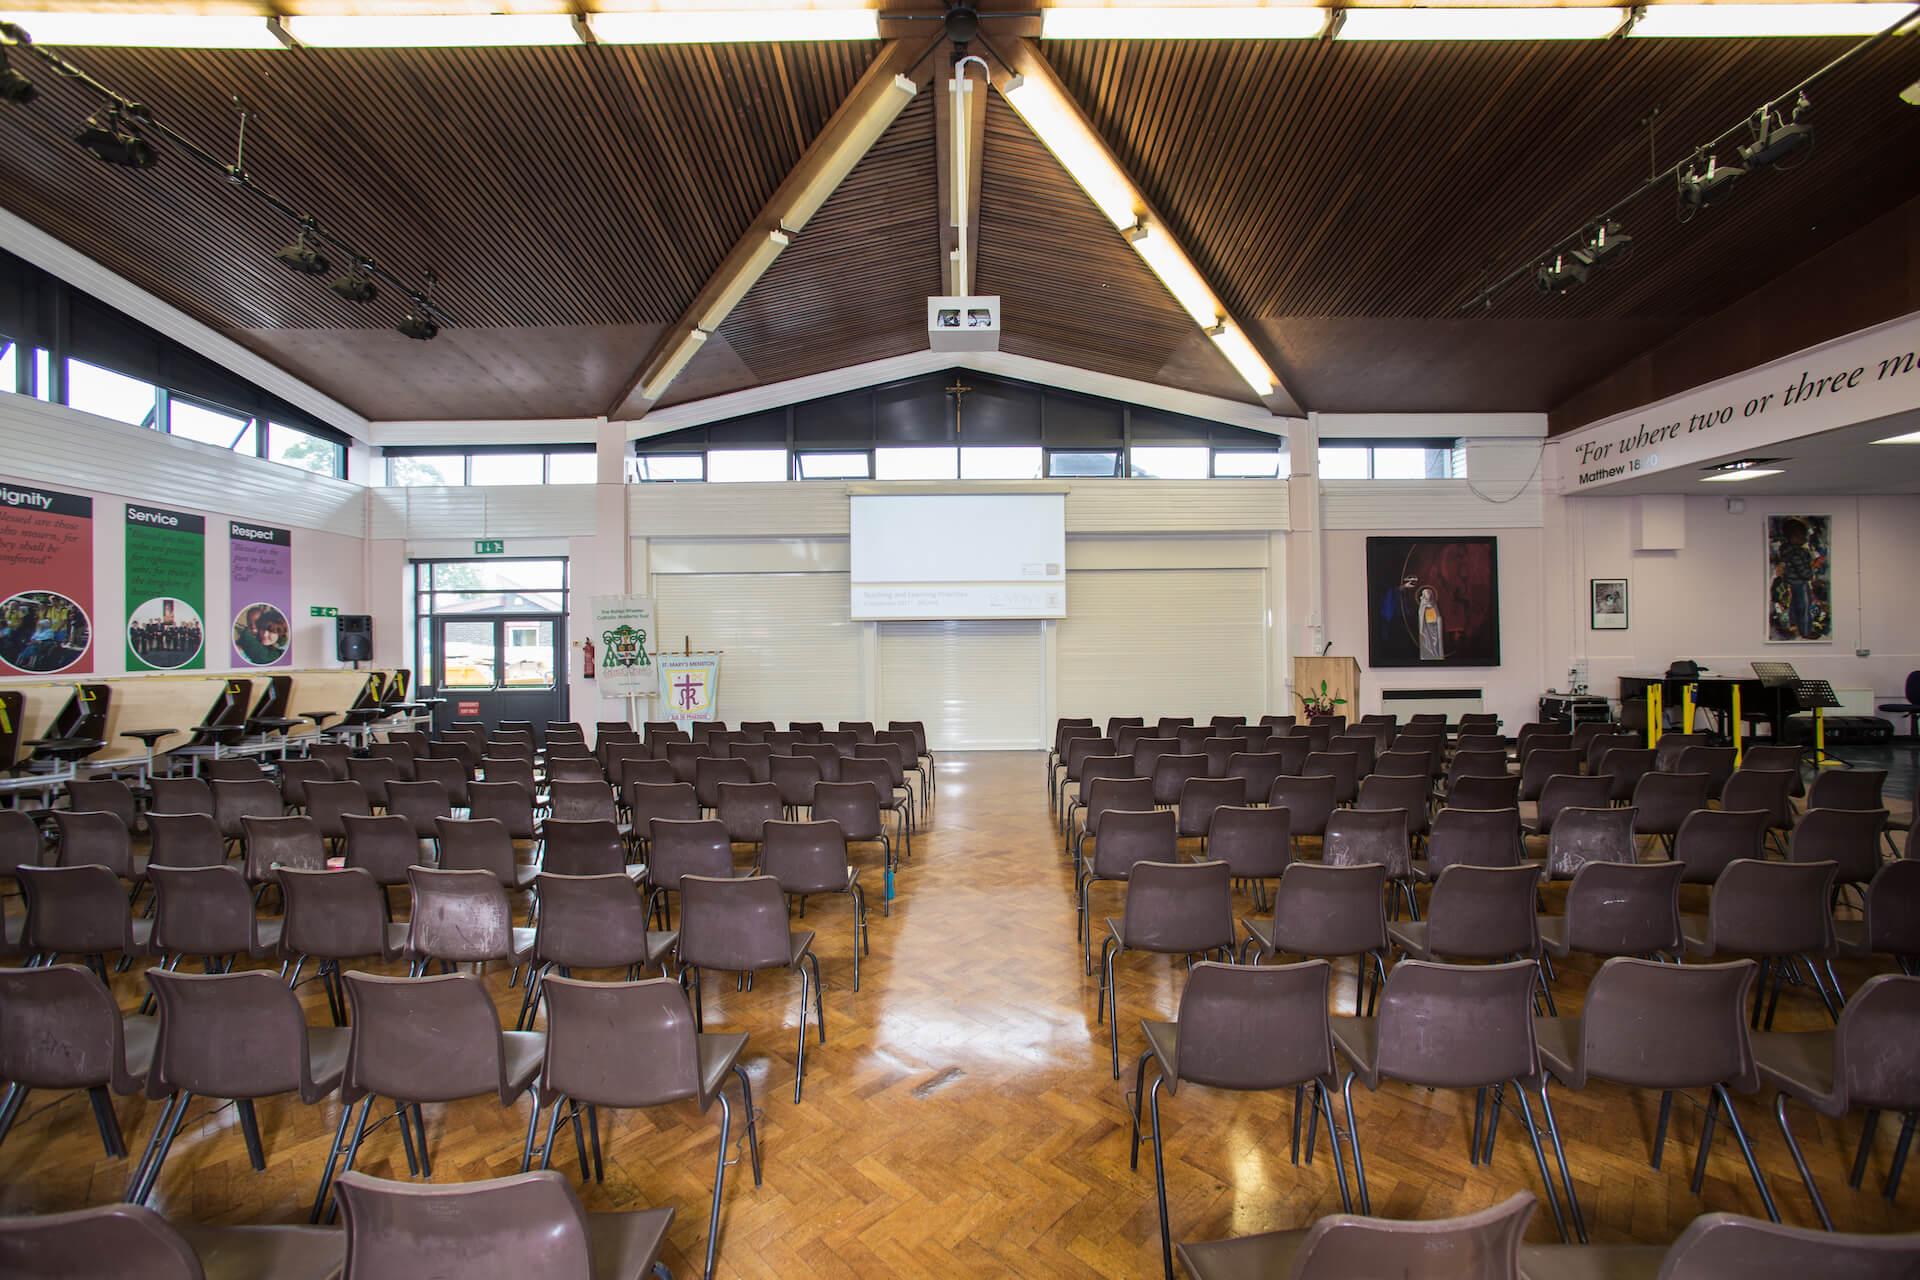 St Mary's School, Menston 7